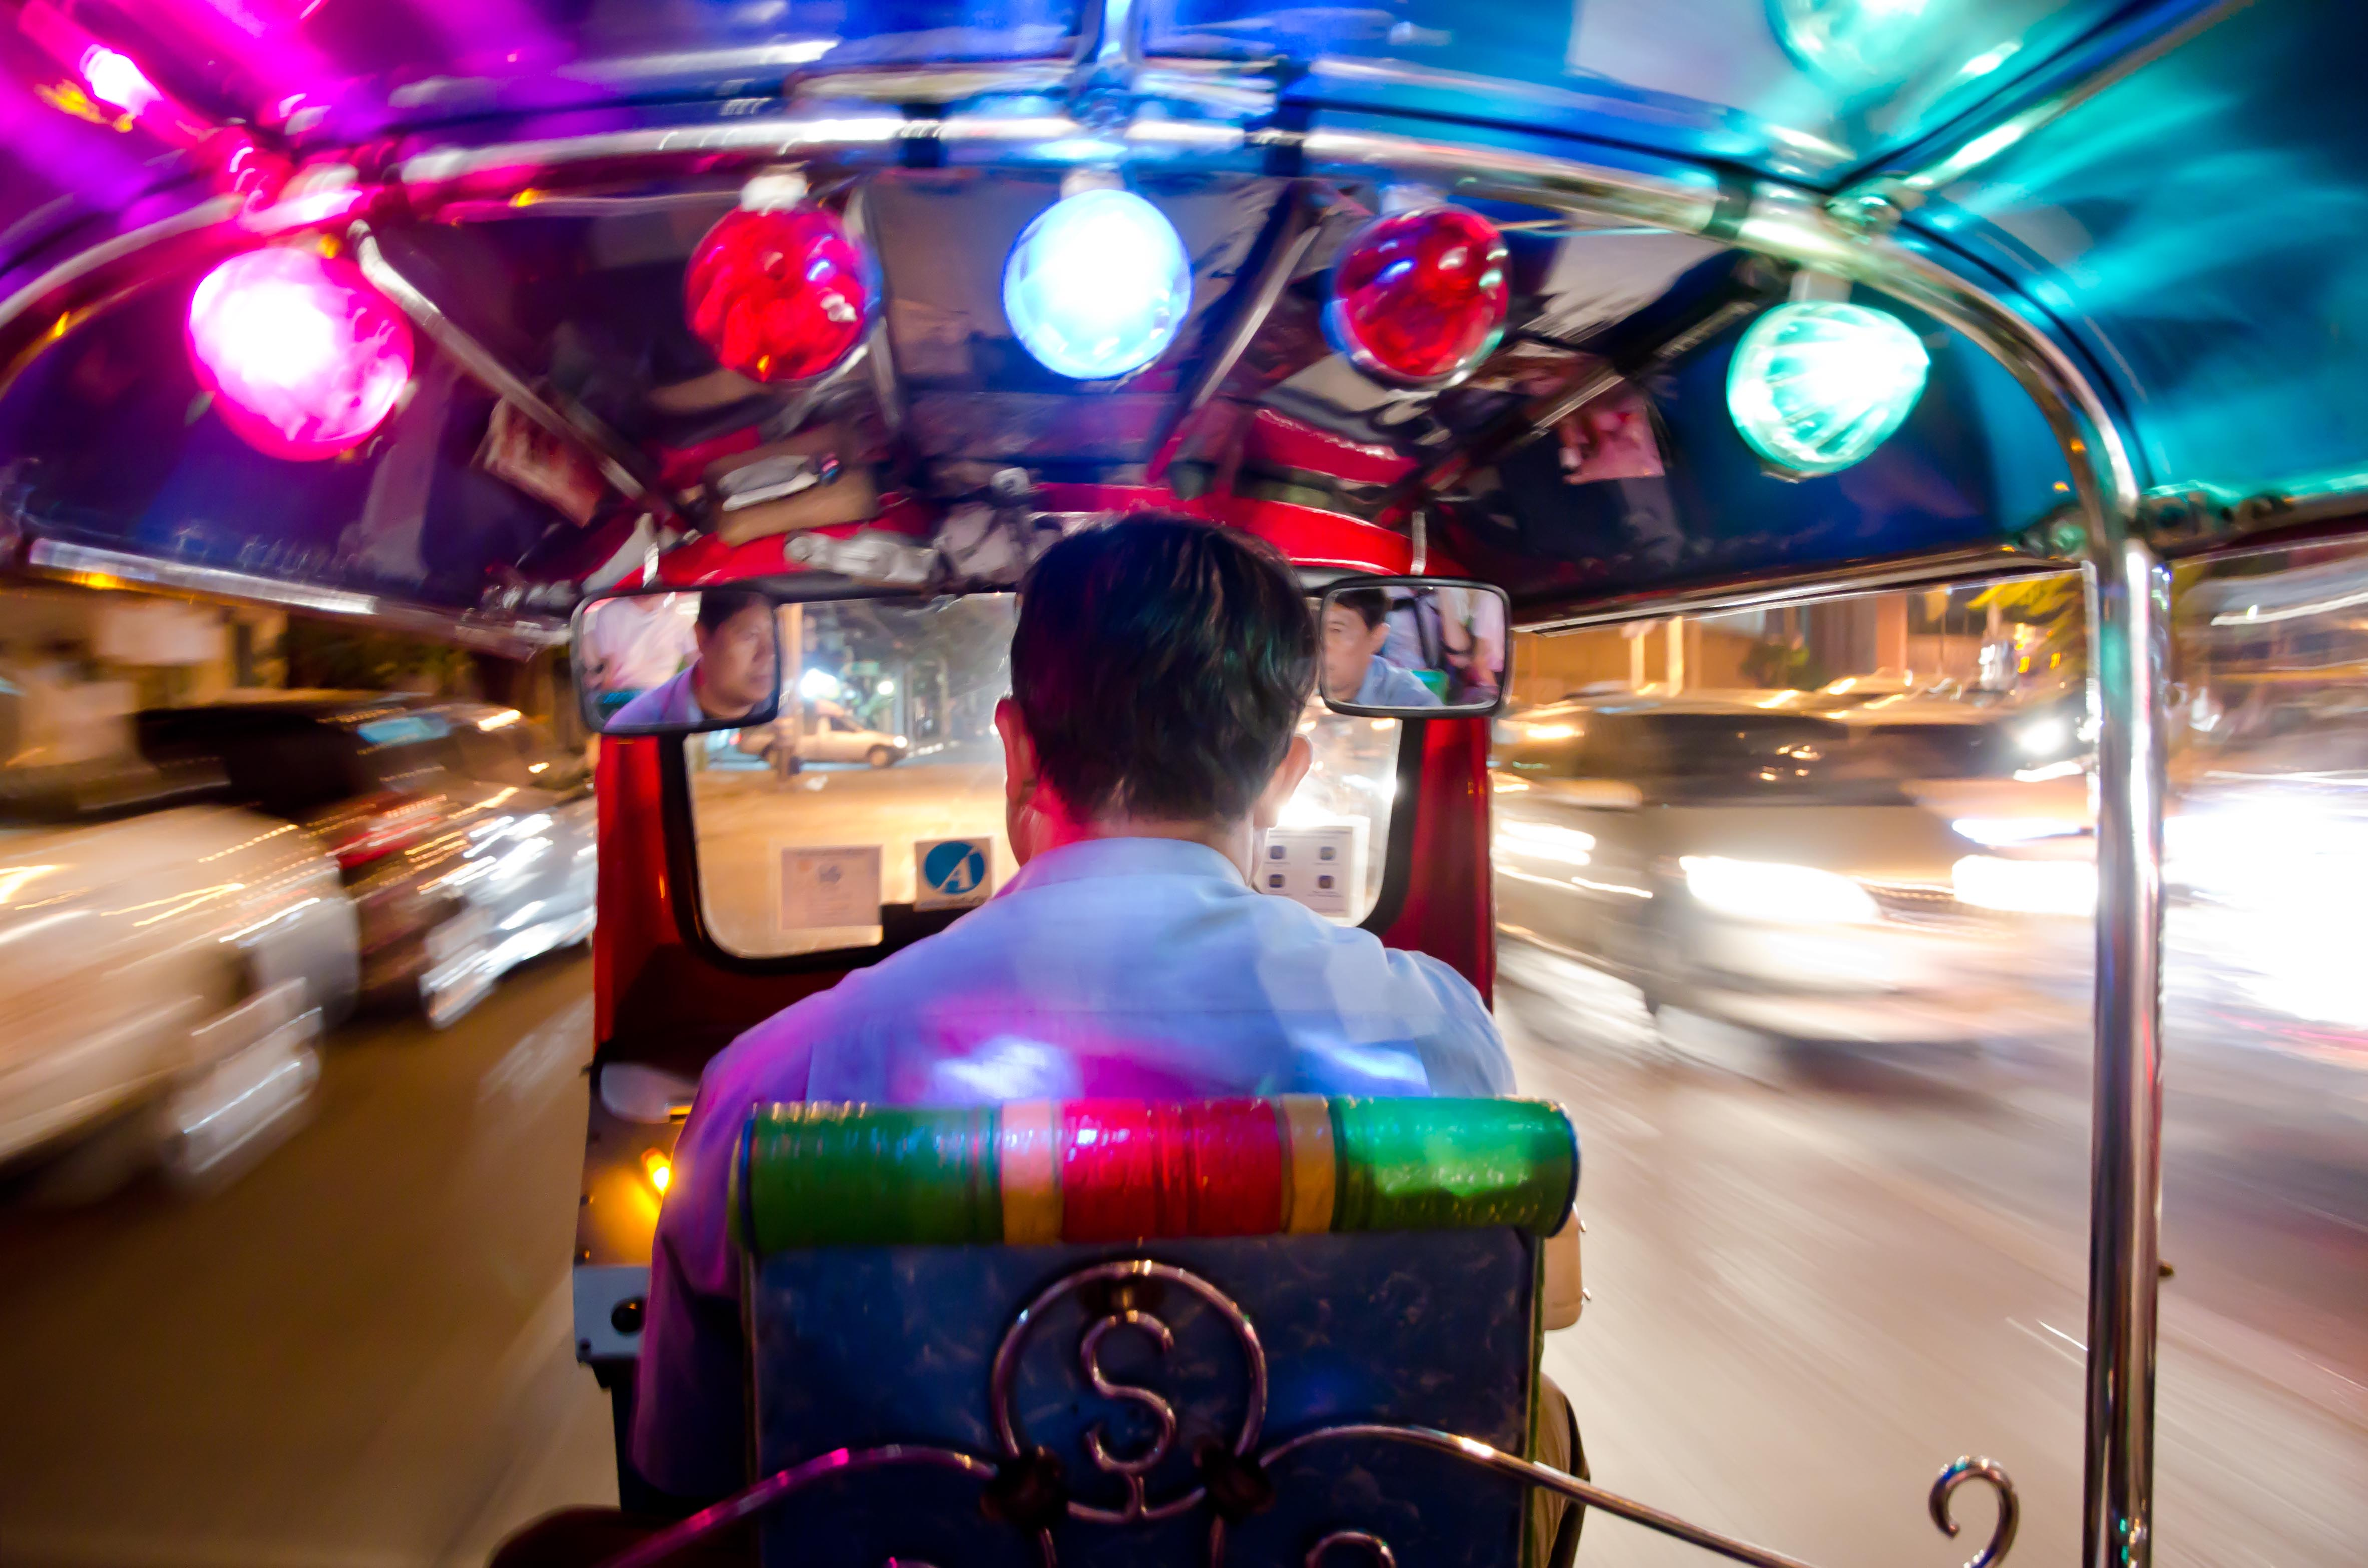 bangkok tuk tuk thrill rides another header. Black Bedroom Furniture Sets. Home Design Ideas